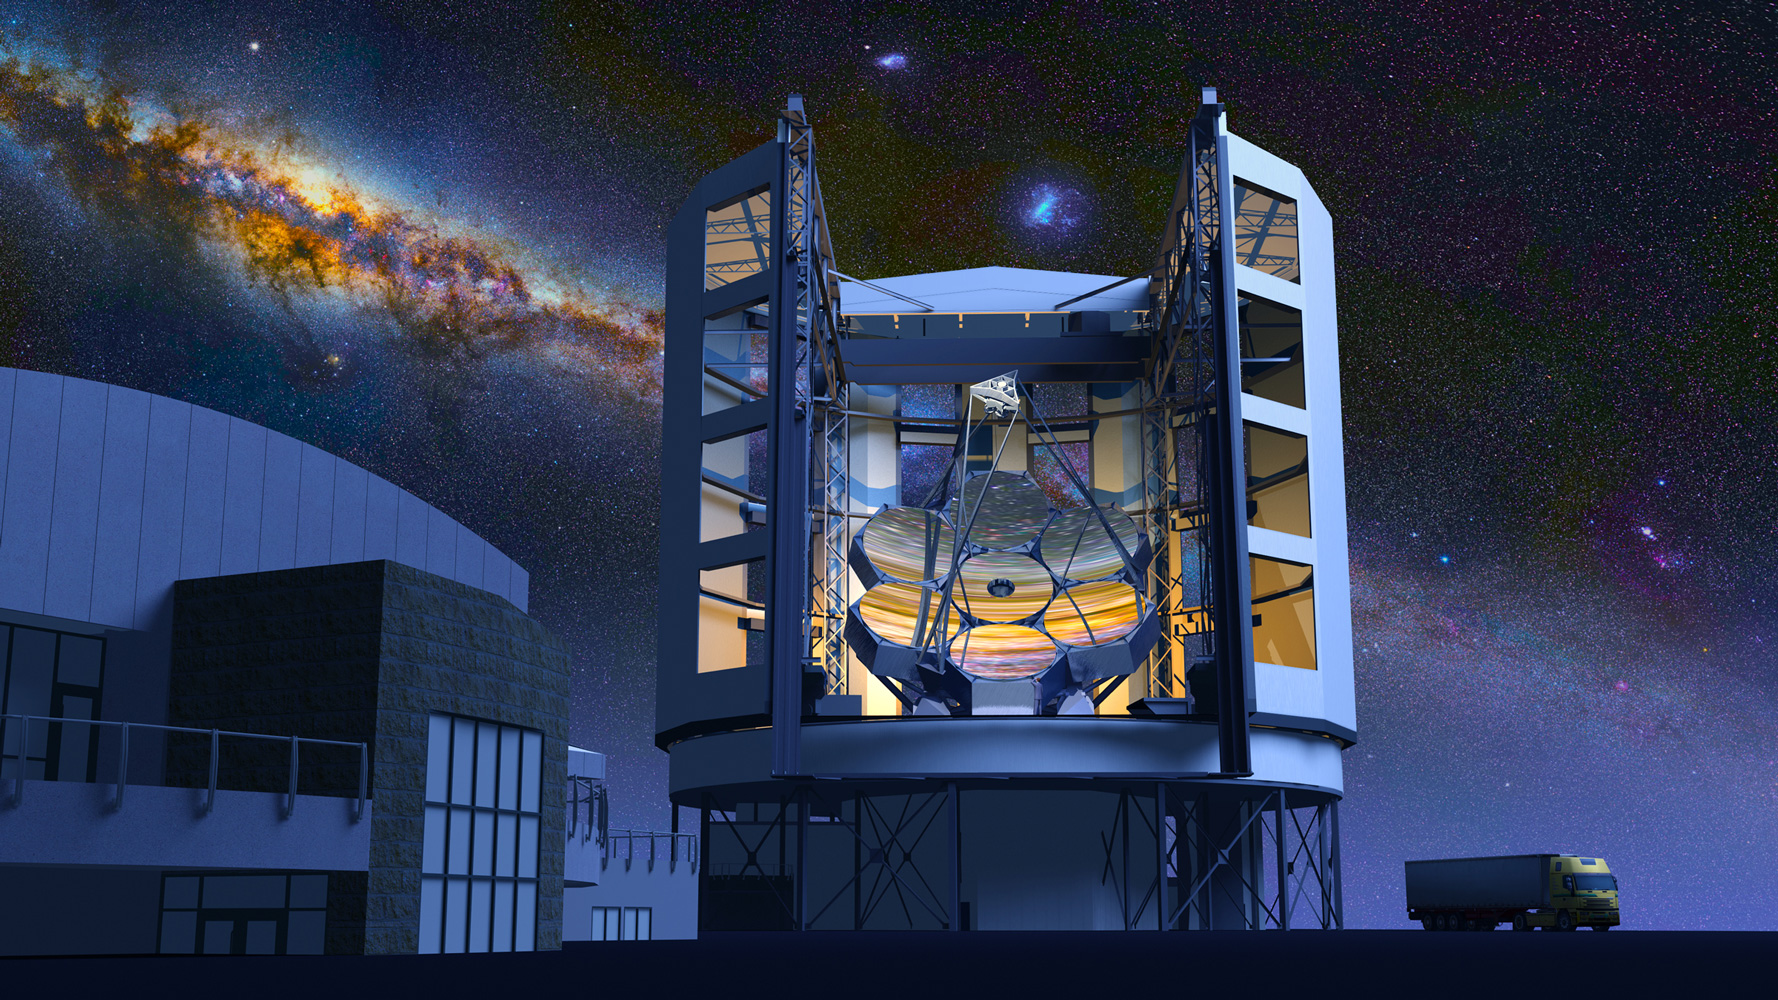 Image: Télescope Magellan